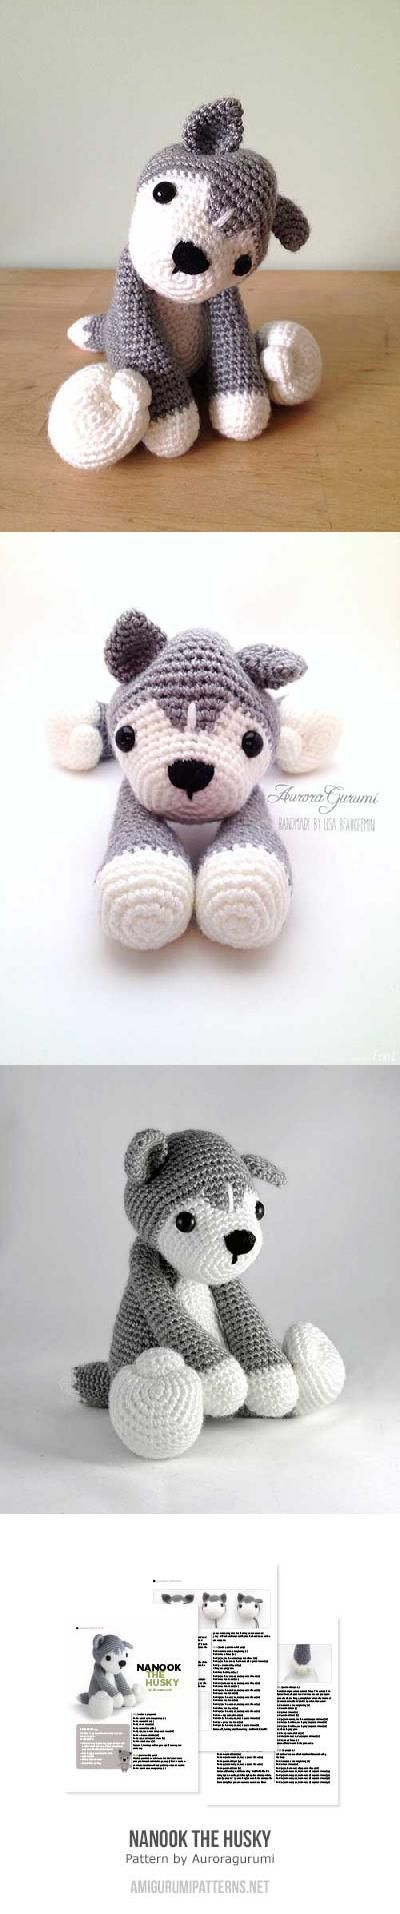 Nanook the husky amigurumi pattern by AuroraGurumi